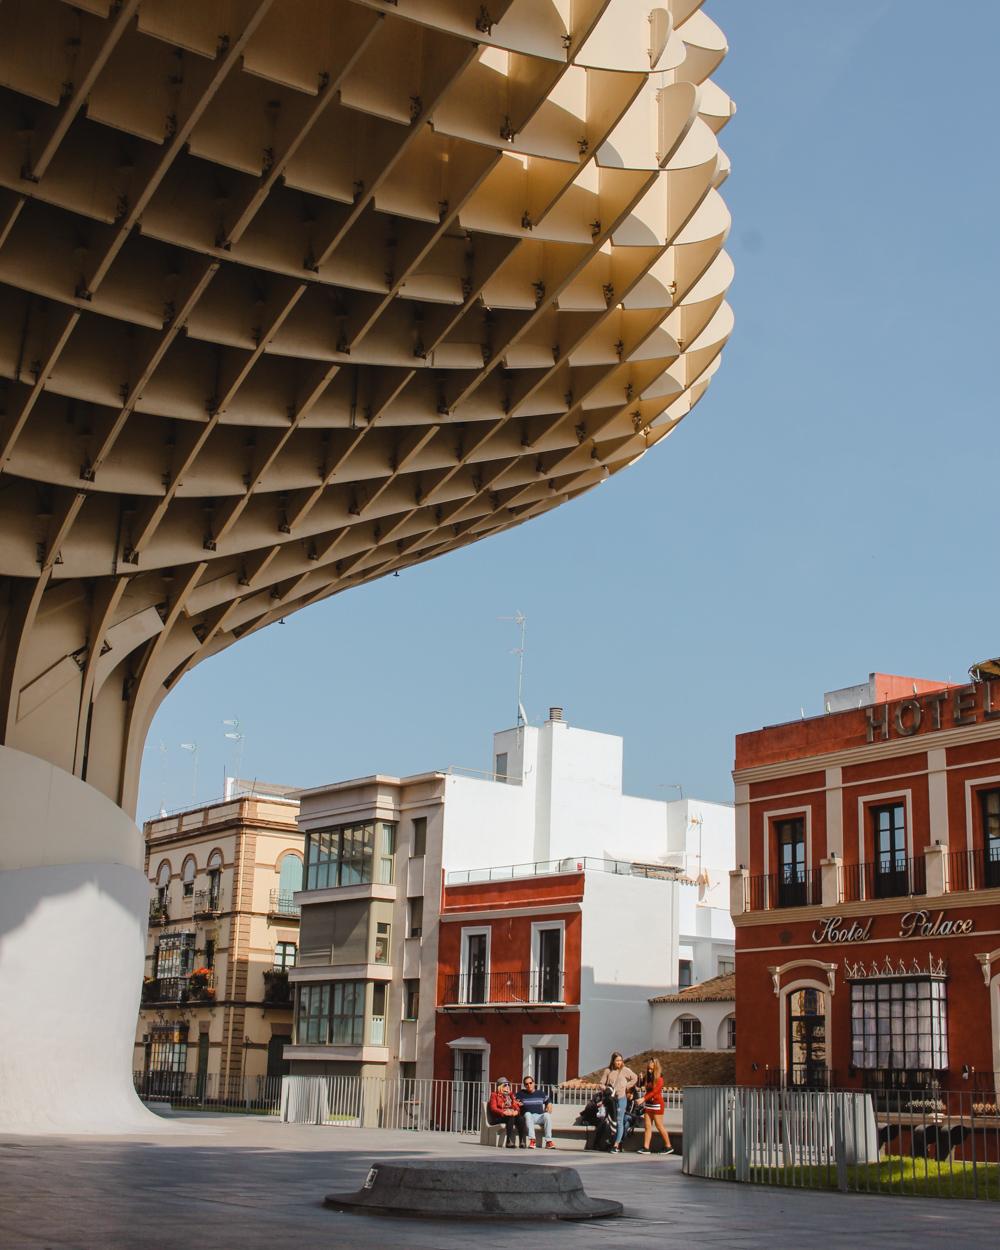 Travel Guide Seville, Spain. Metropol parasol